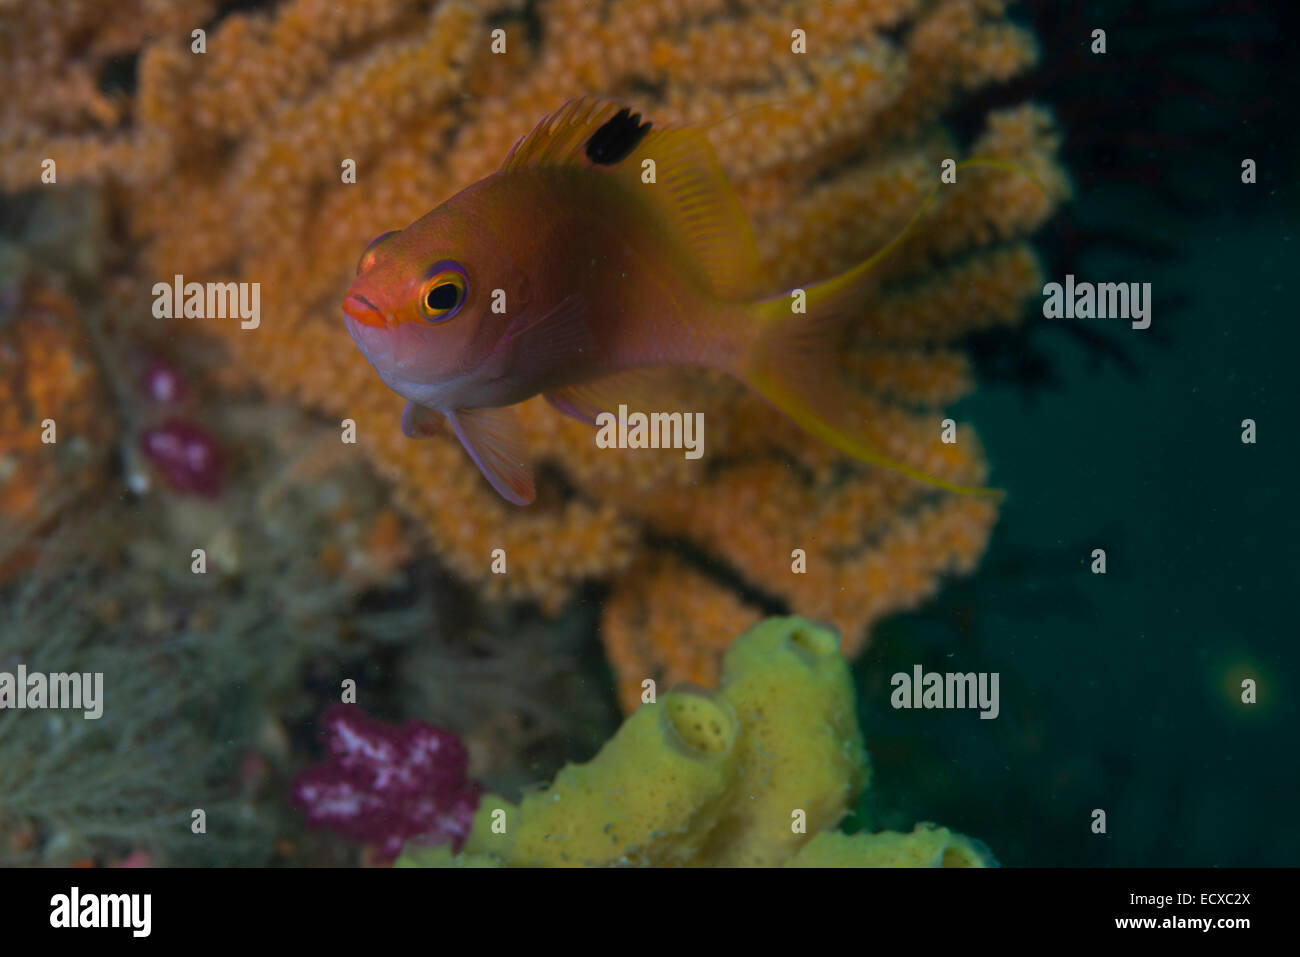 Sacura margaritacea  (Hilgendorf, 1879). Gyosho ( fish reef ) point, Owase, Mie, Japan - Stock Image